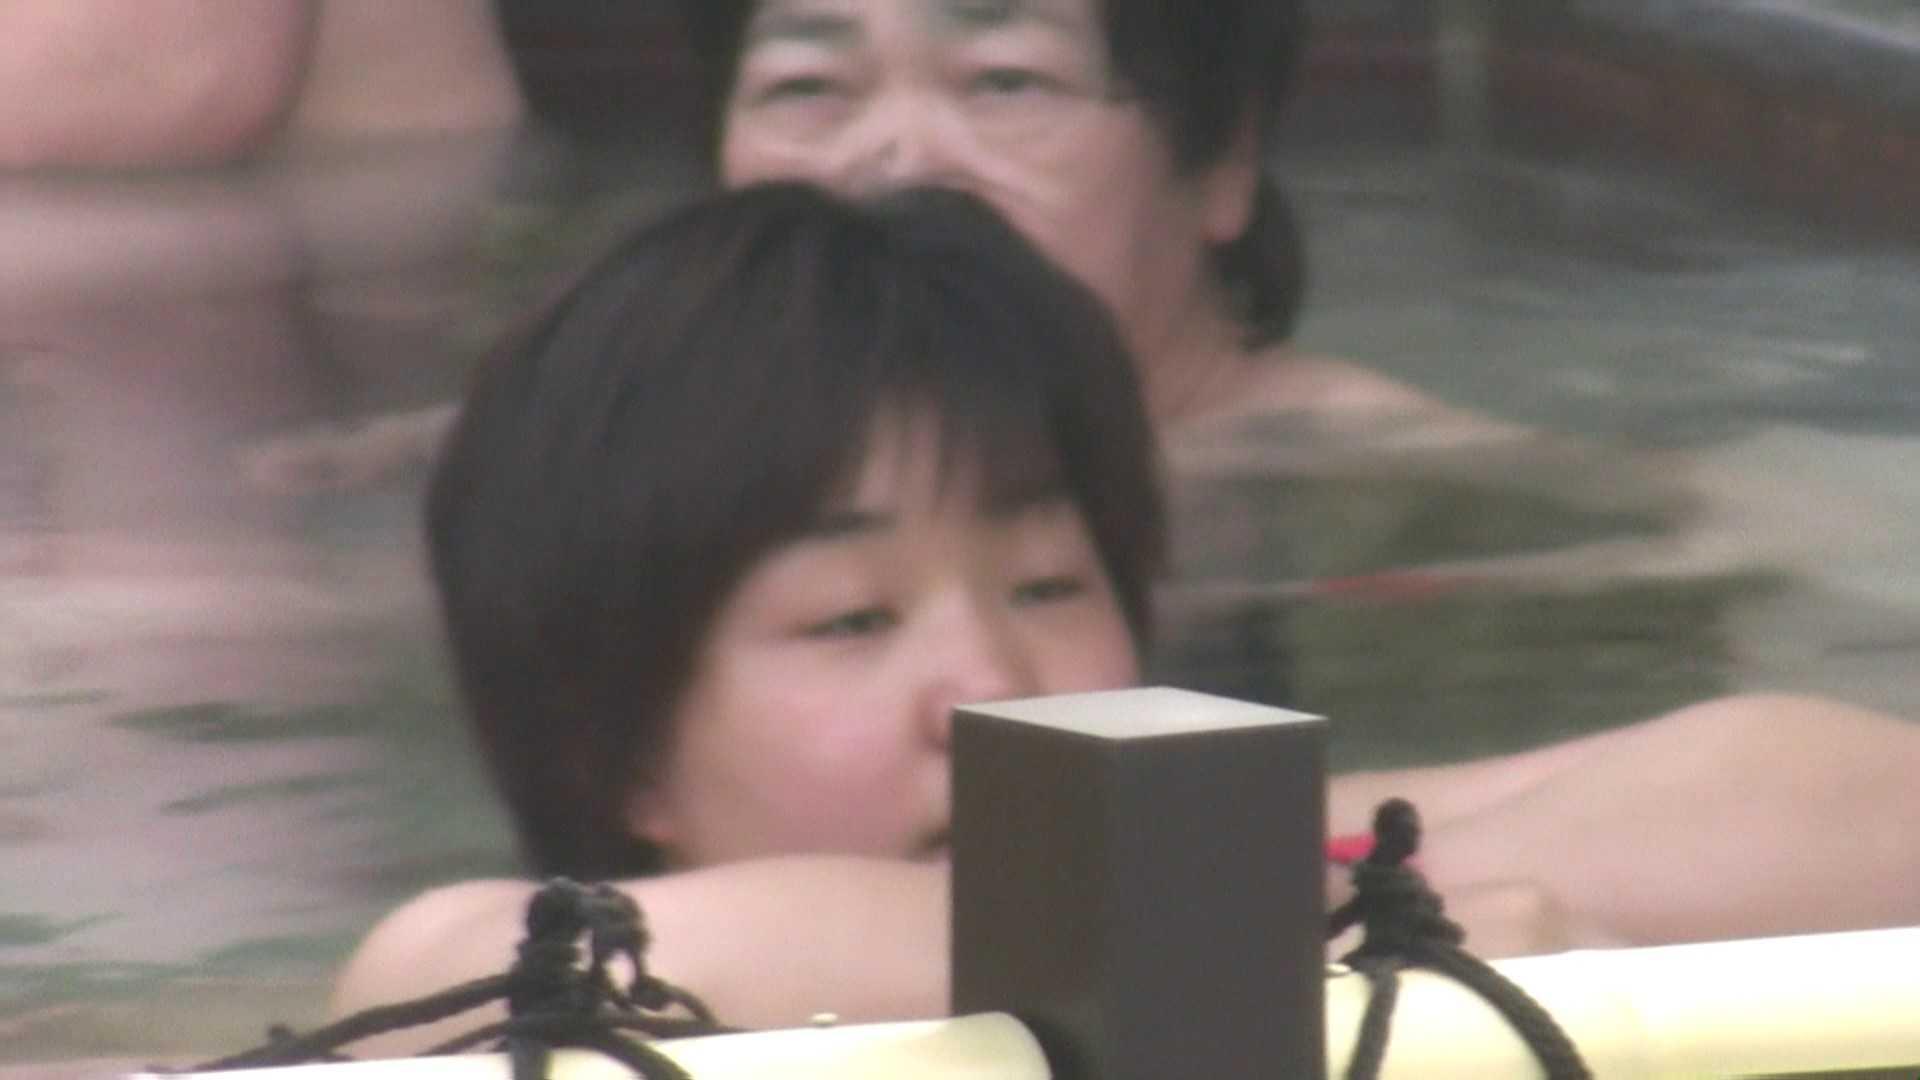 Aquaな露天風呂Vol.53【VIP限定】 OLエロ画像 盗撮おめこ無修正動画無料 54PICs 23